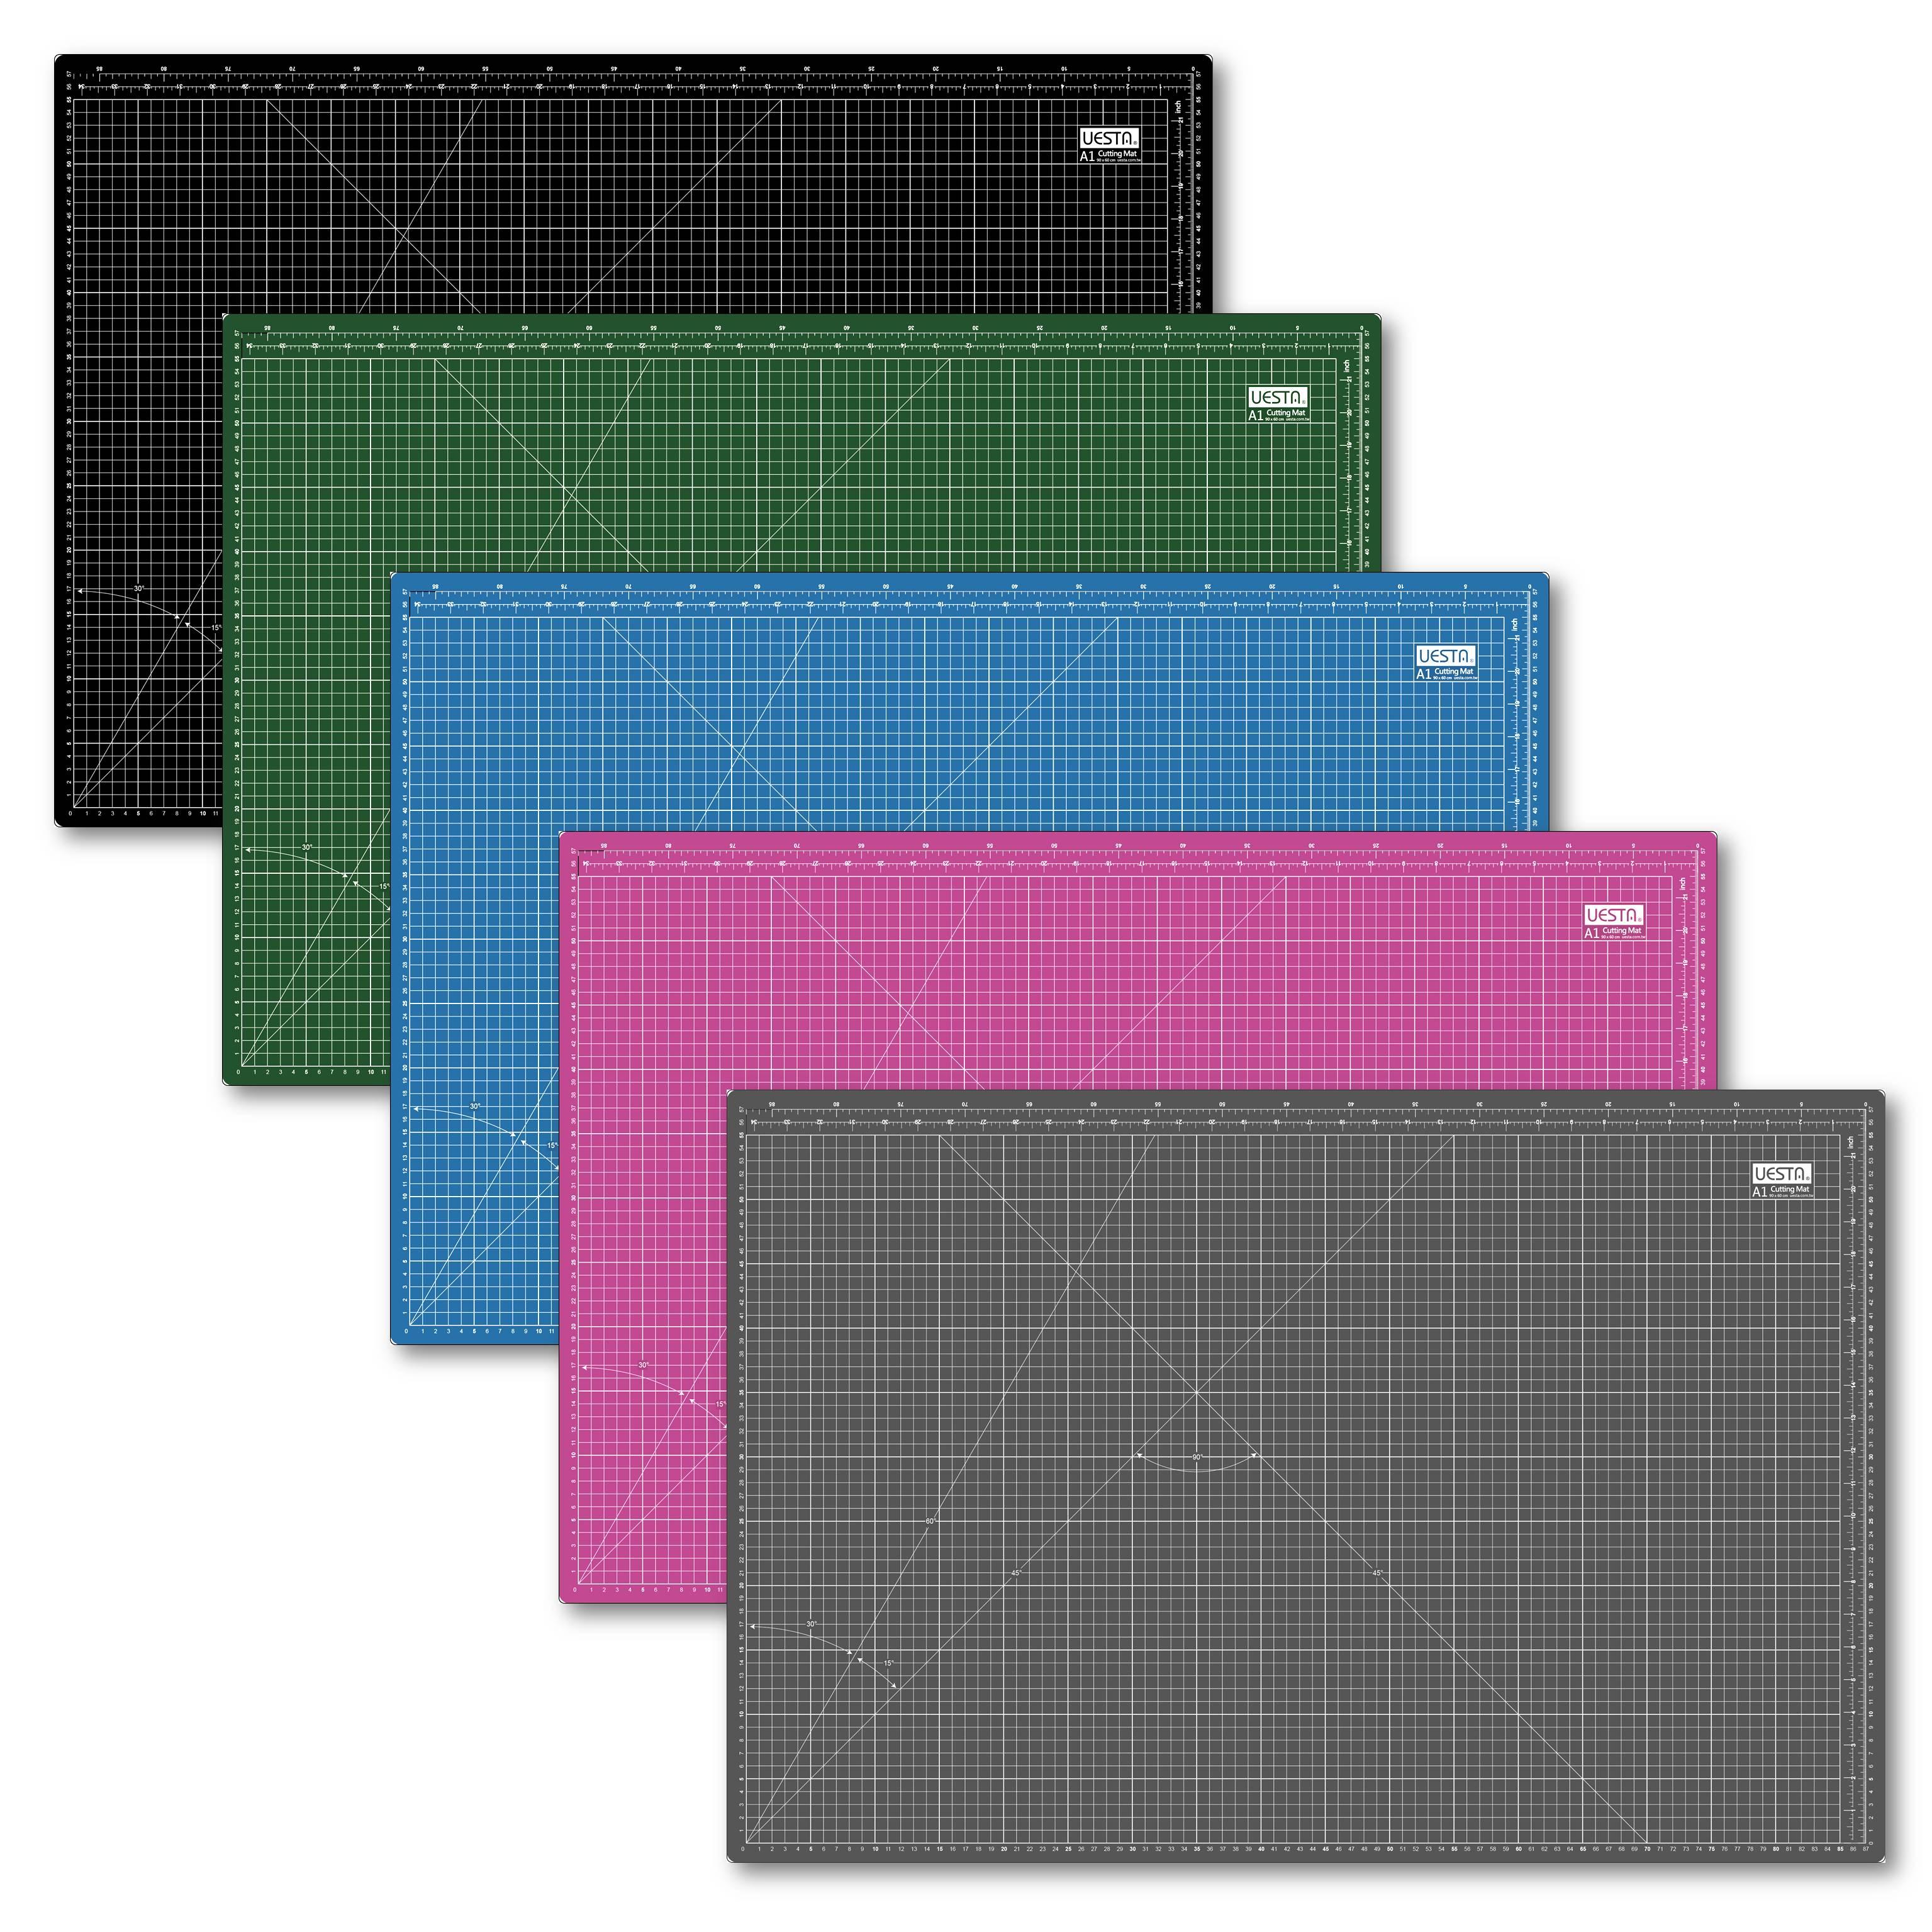 A1 Size UESTA 90 x 60 CM Grid PVC Self Healing Cutting Mats